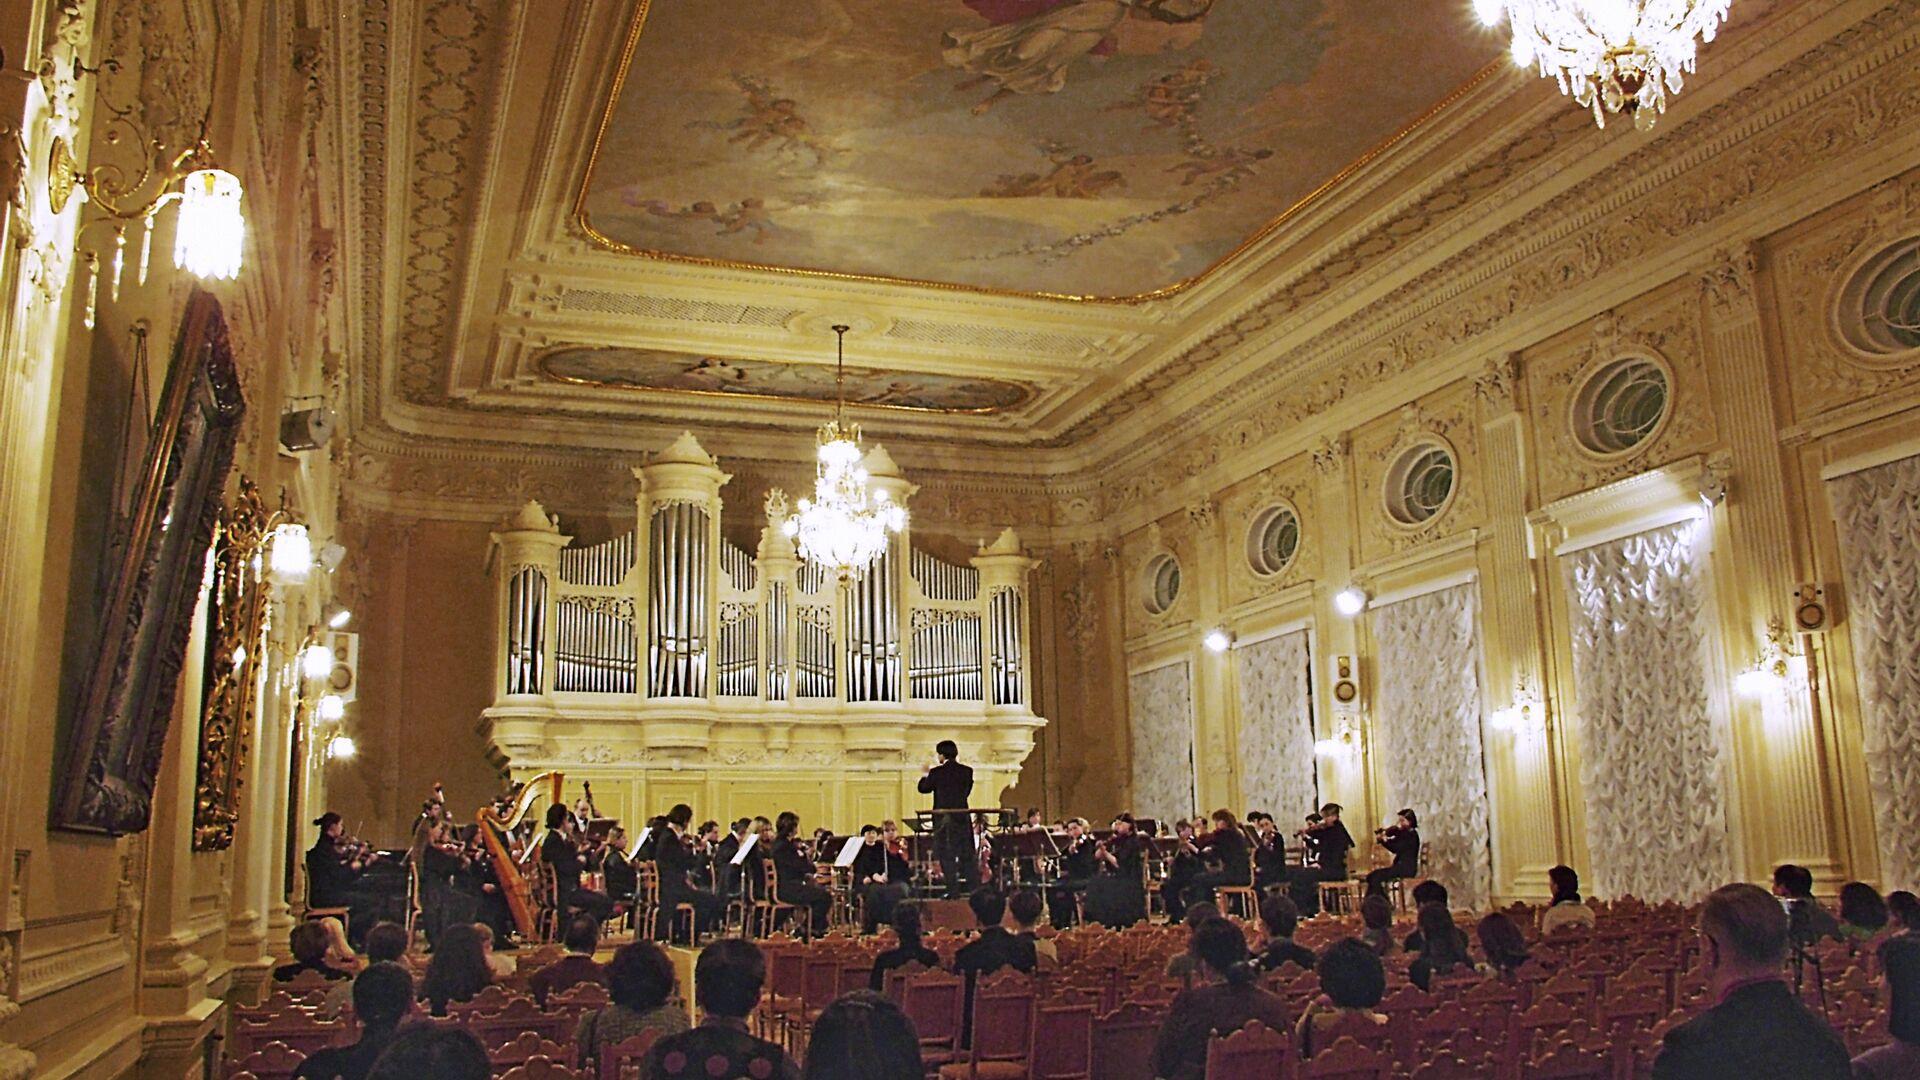 Зал в консерватории в Санкт-Петербурге - РИА Новости, 1920, 30.09.2020